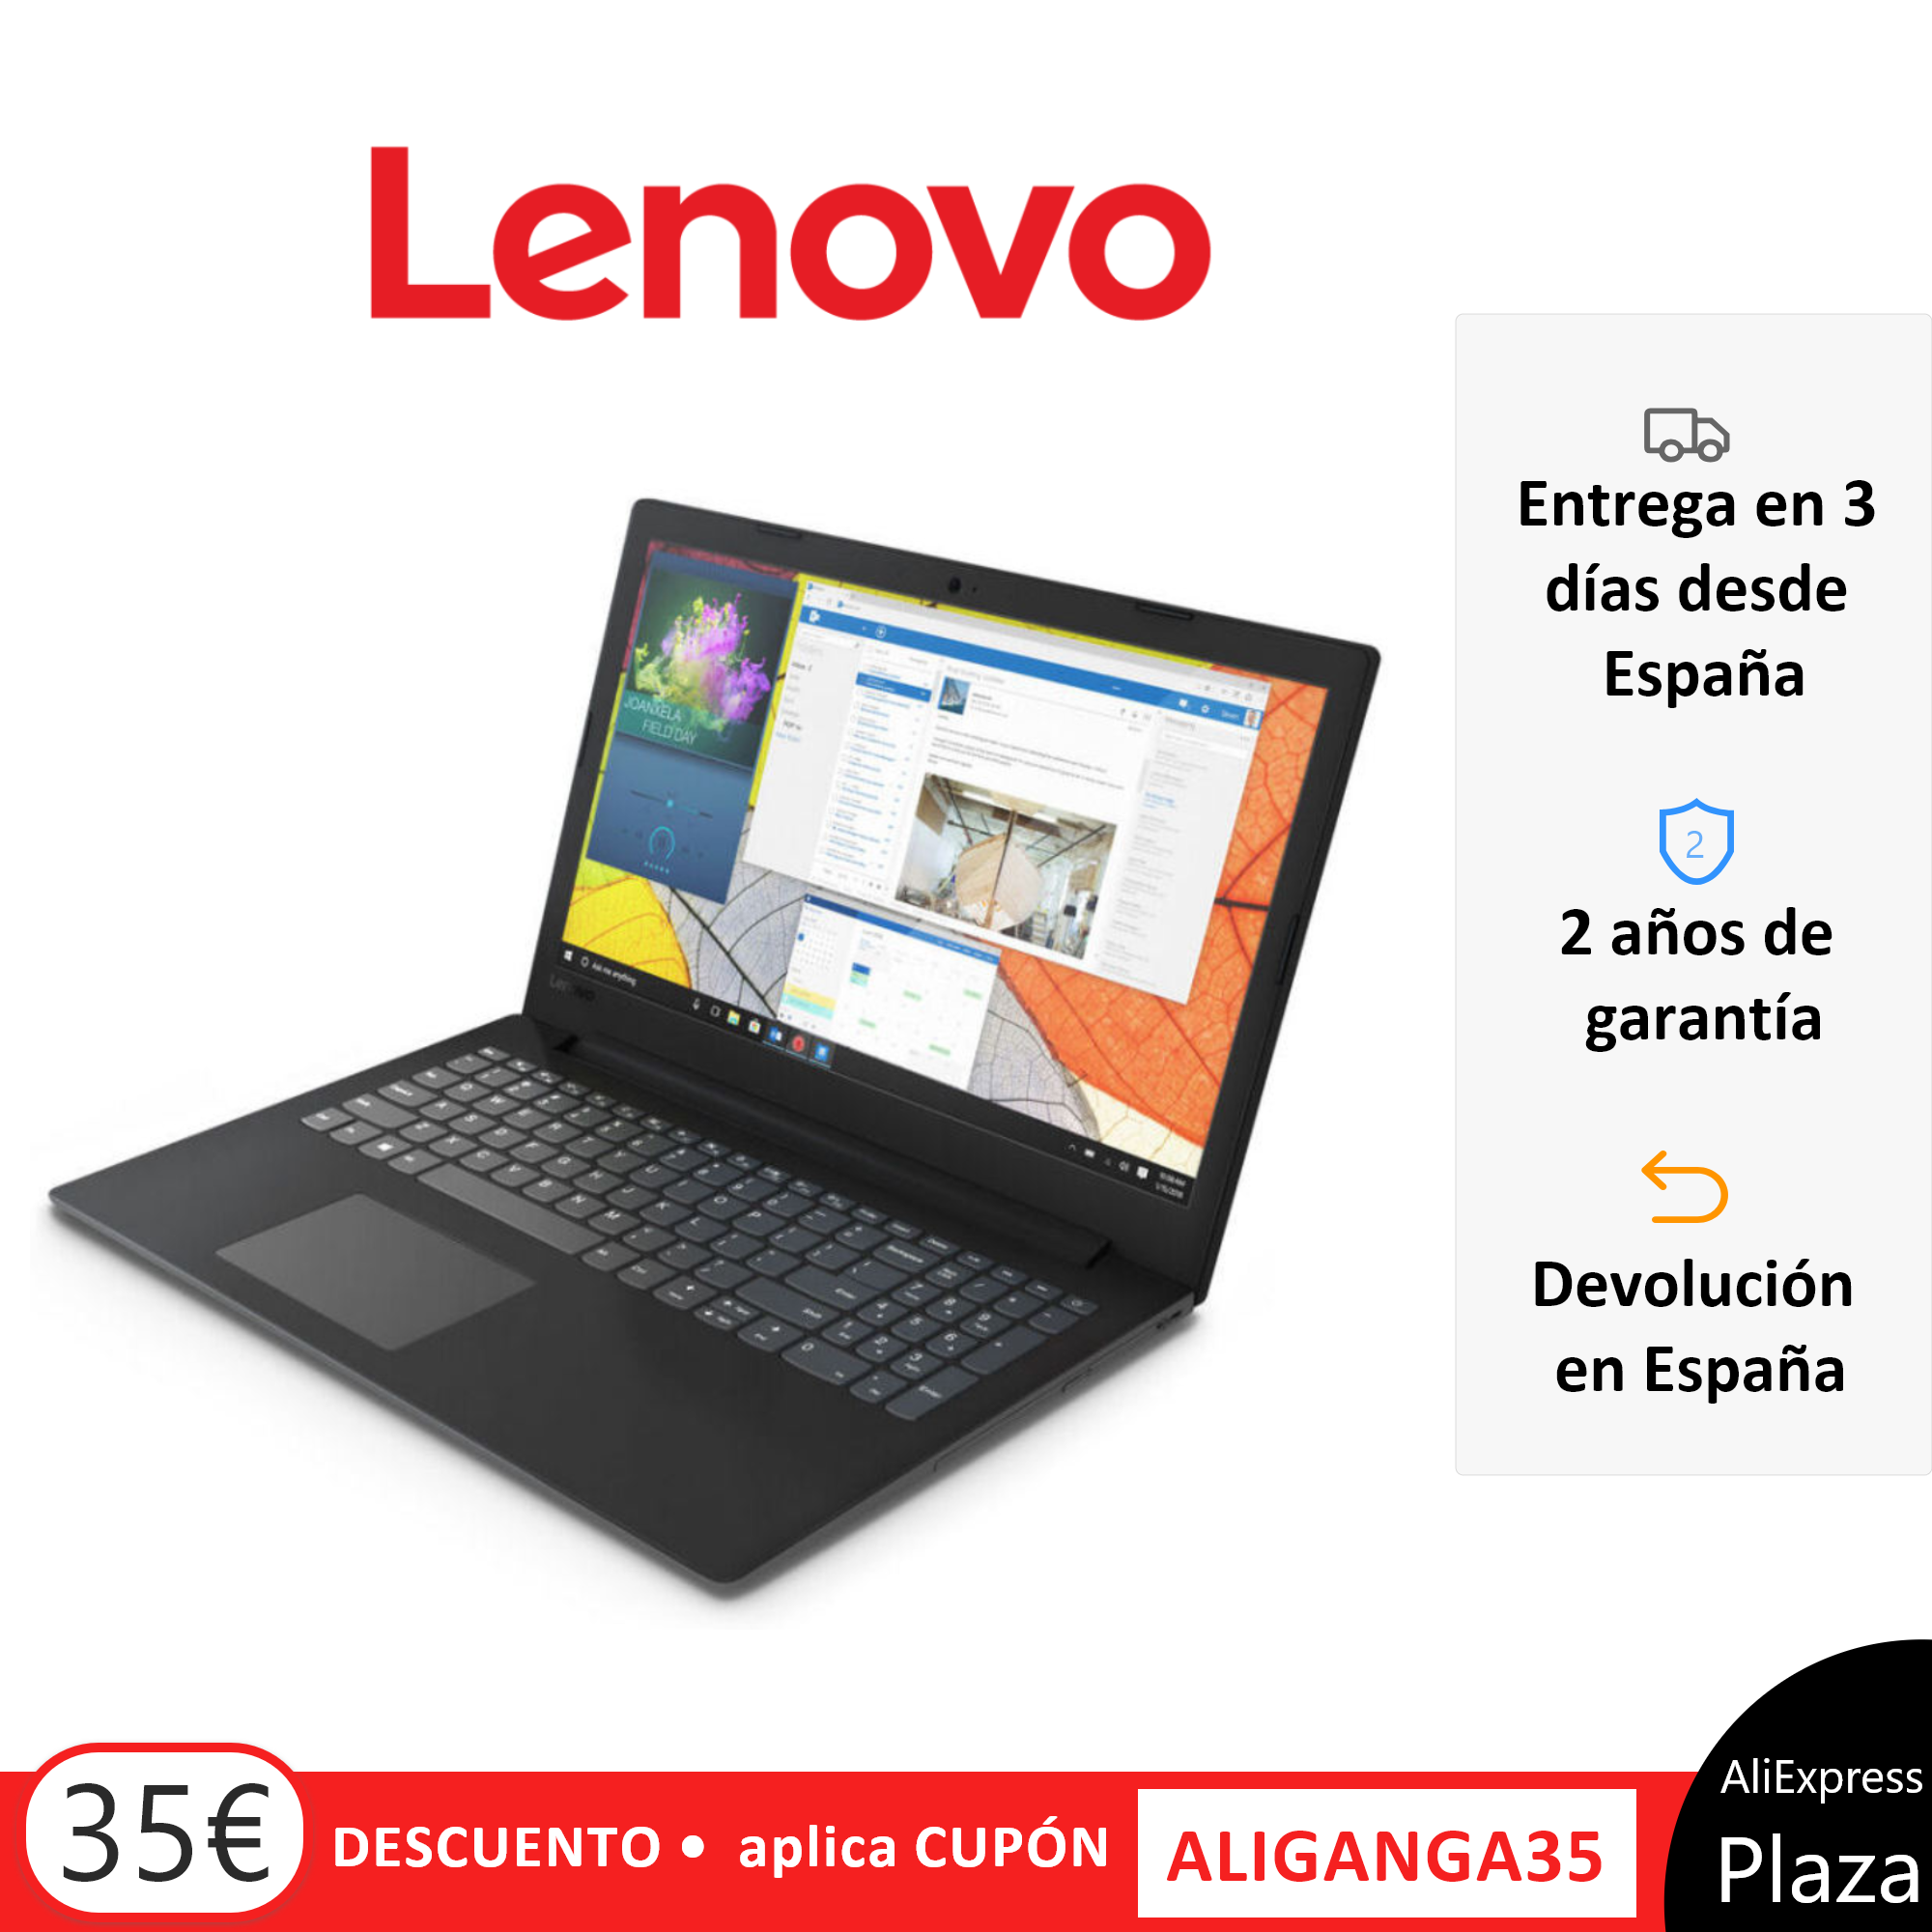 LAPTOP 15 ''-LENOVO V145-15AST-AMD A9-9425/8 GBGB/256 SSD/RADEON R5- windows 10 Home FHD Keyboard Spanish Dictionary